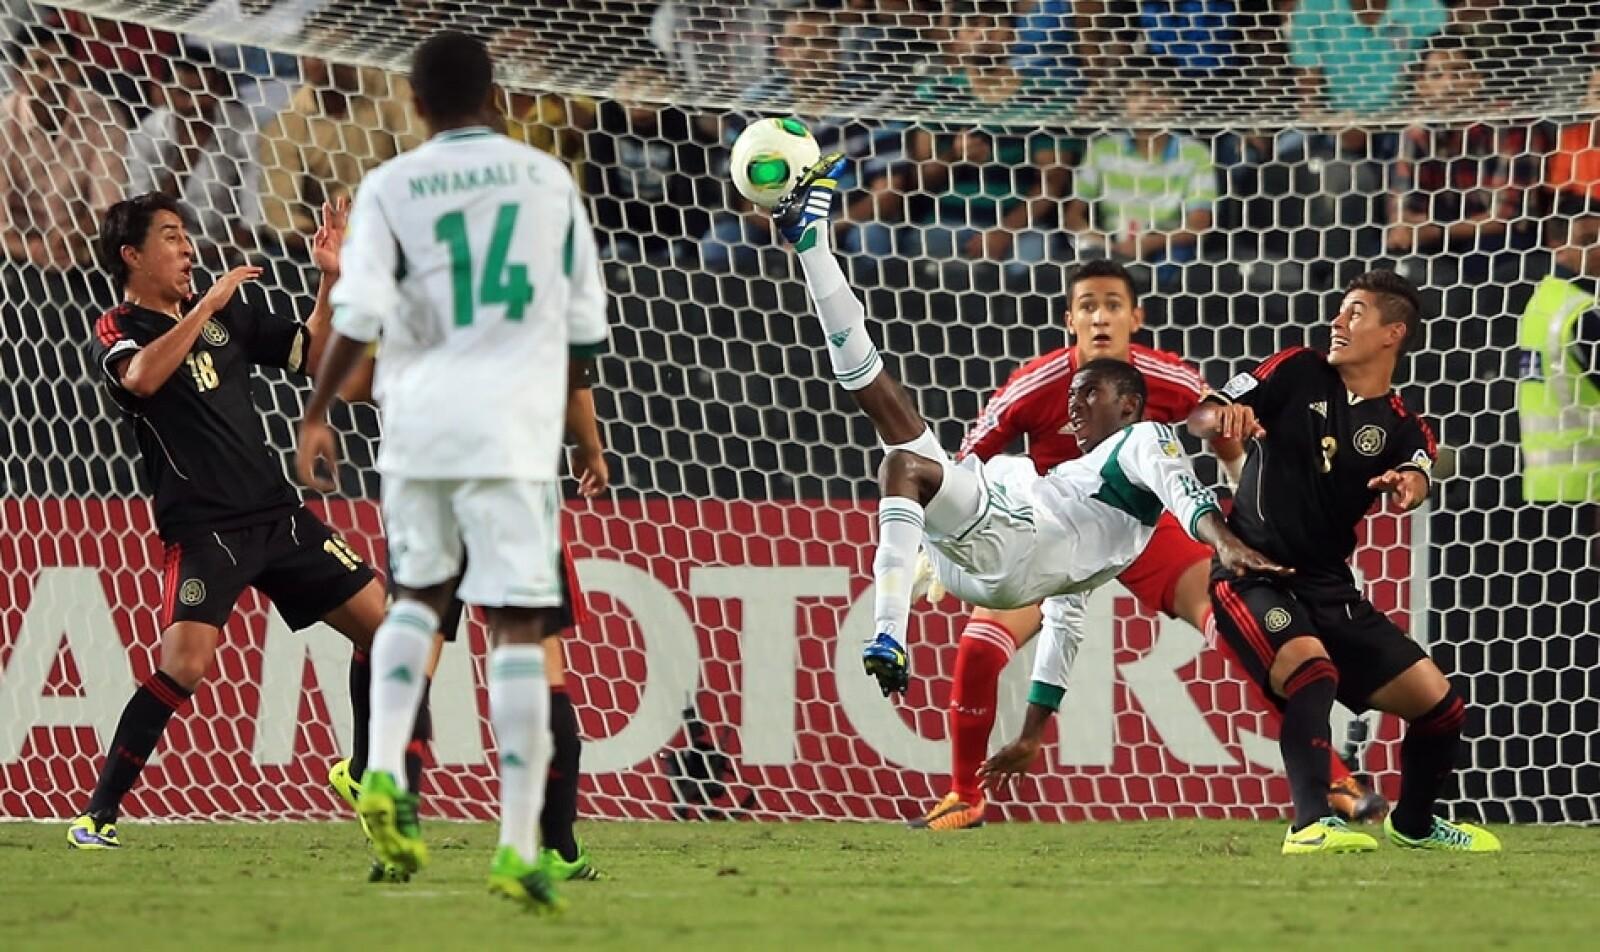 México vs. Nigeria 14